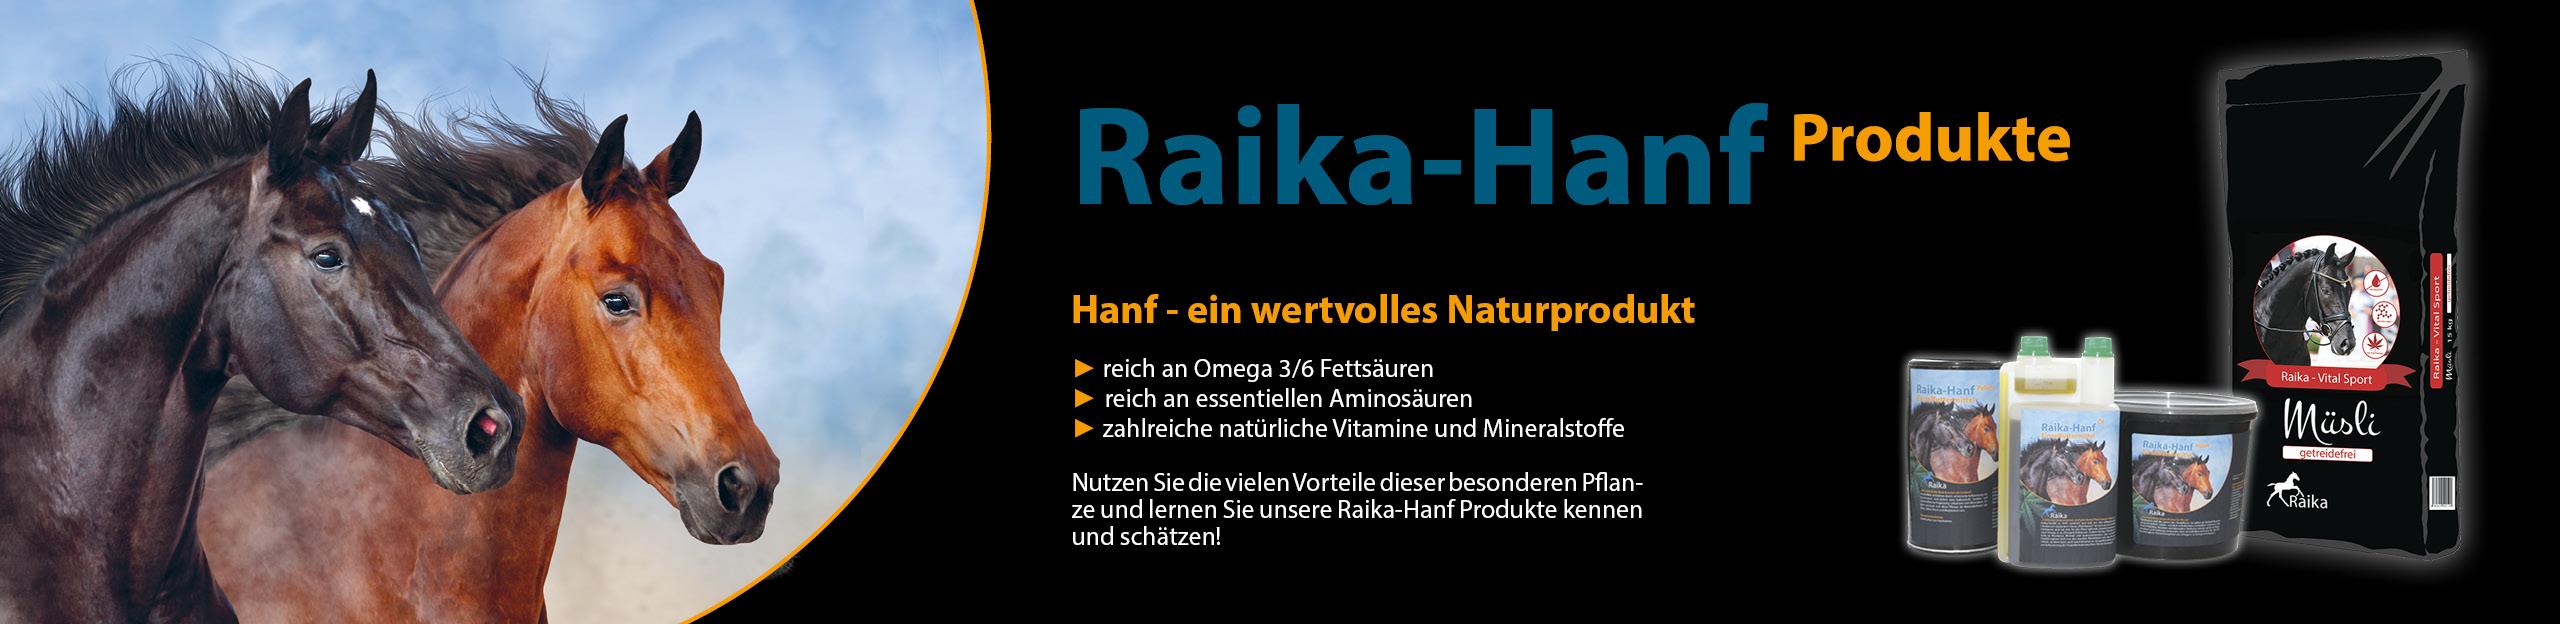 Banner Raika-Hanf Serie - neu